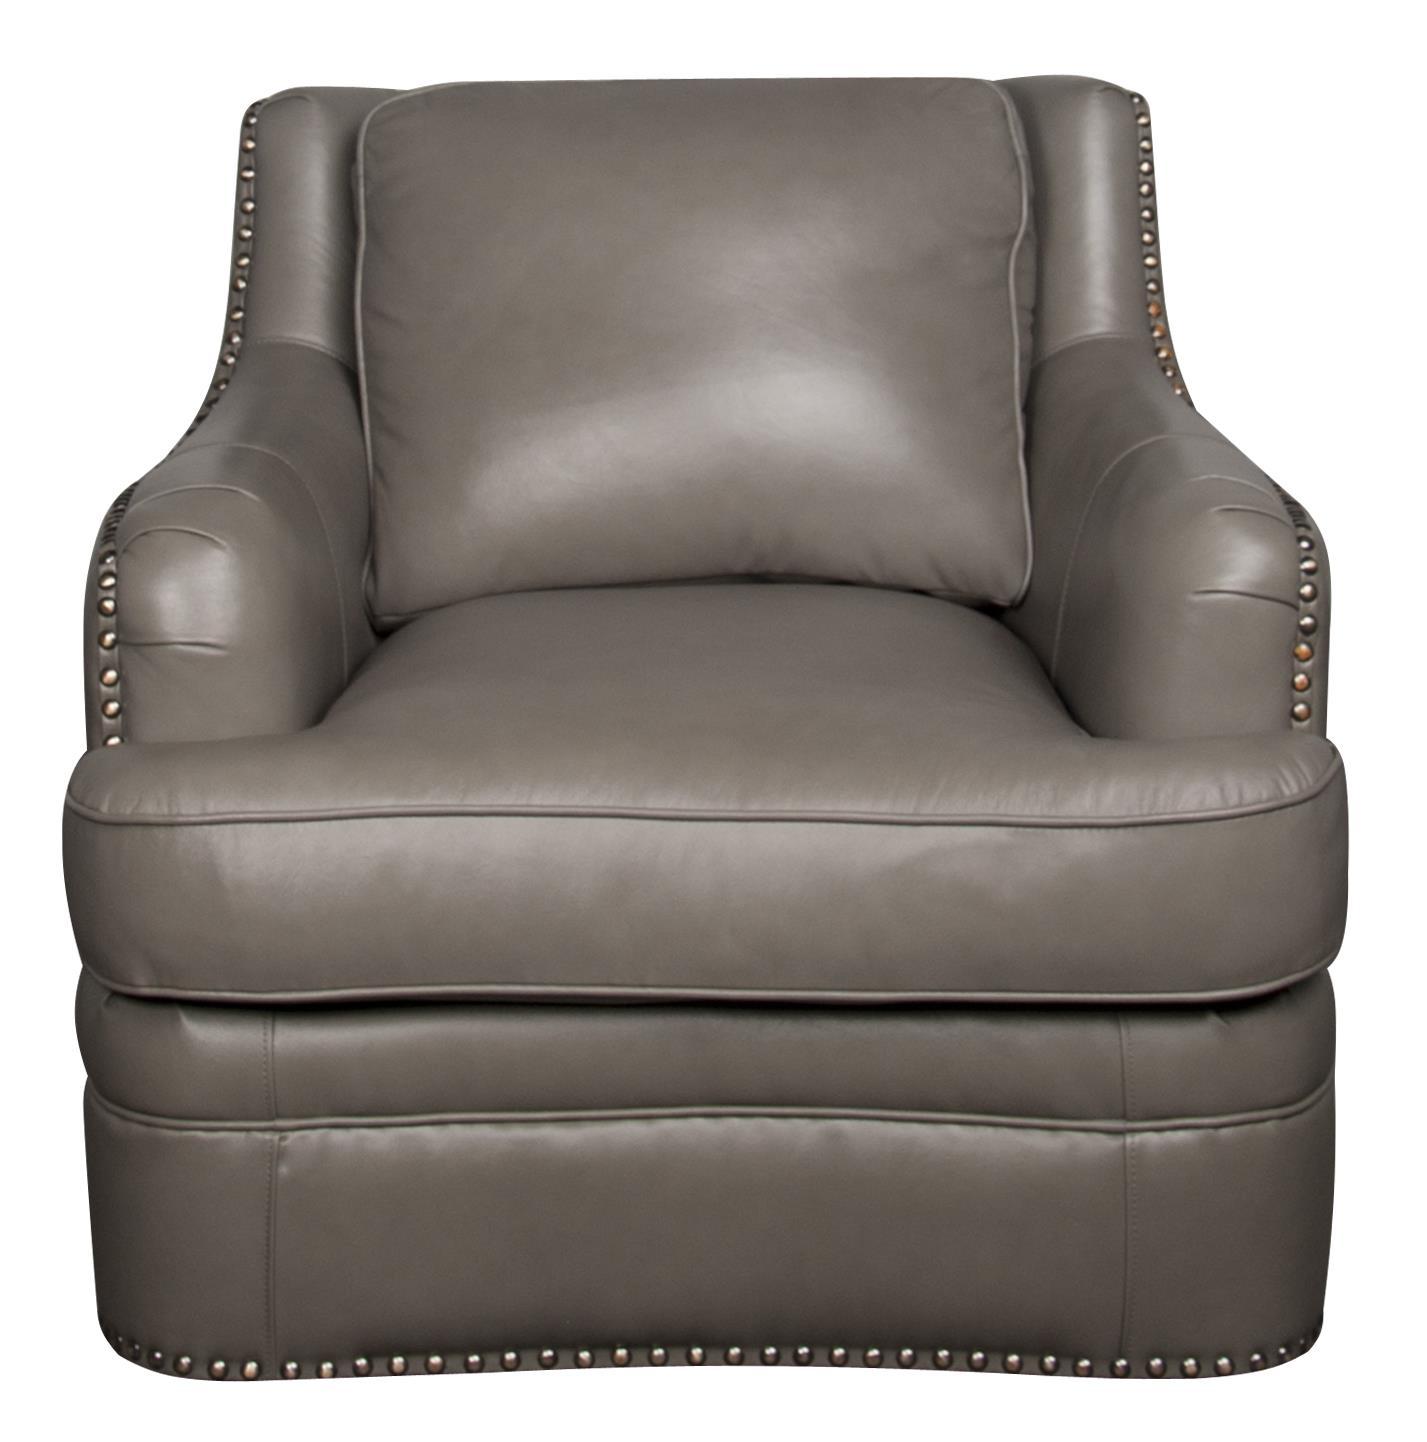 Morris Home Furnishings Maya Maya 100% Leather Chair - Item Number: 700251379